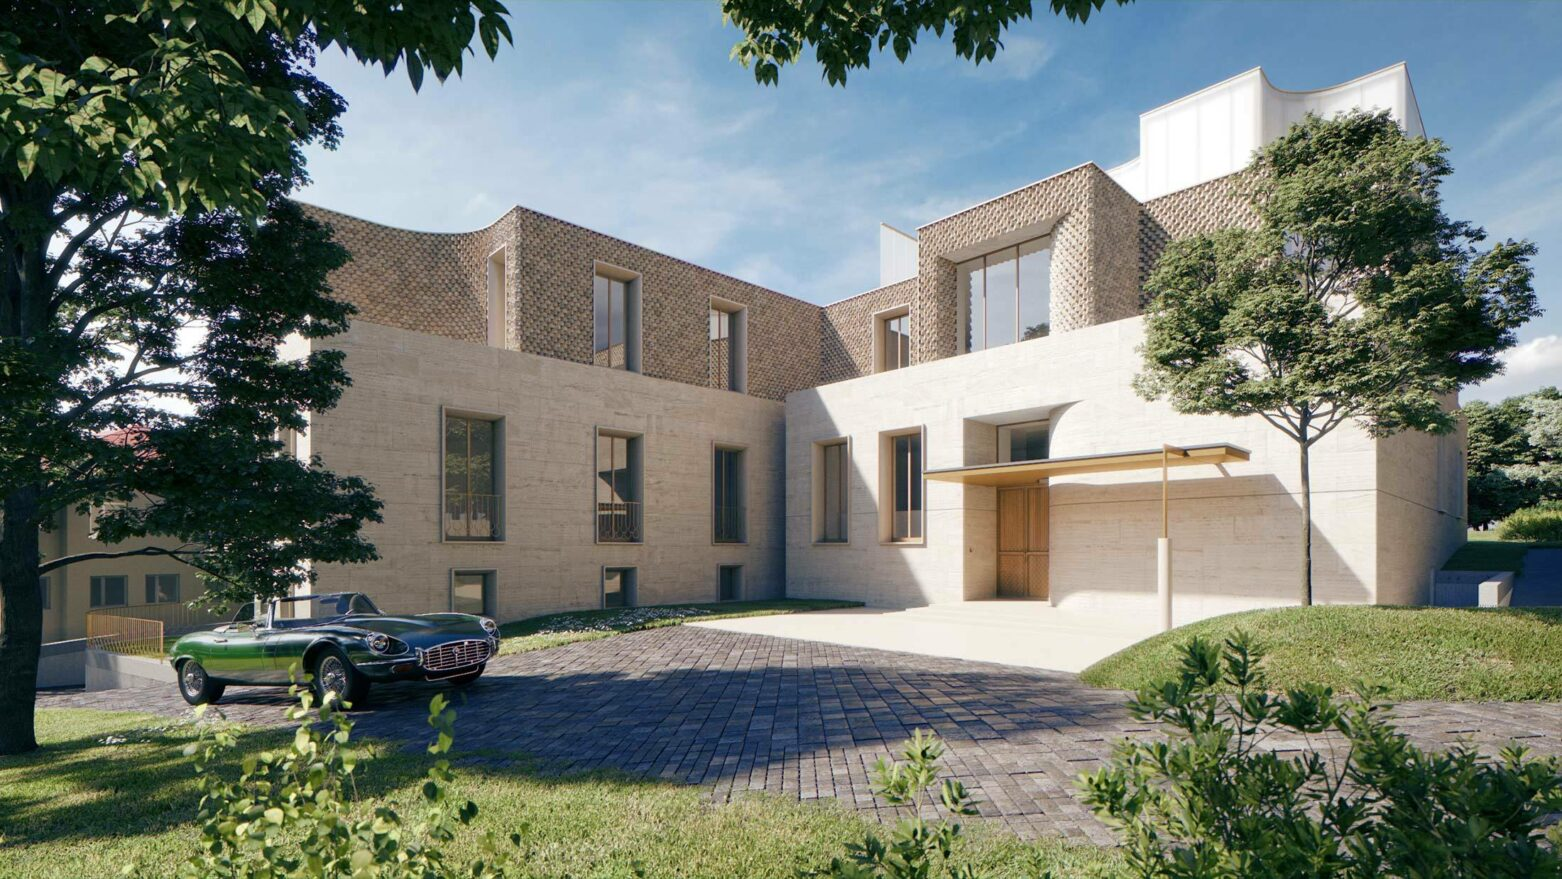 Labvert Architecture Design